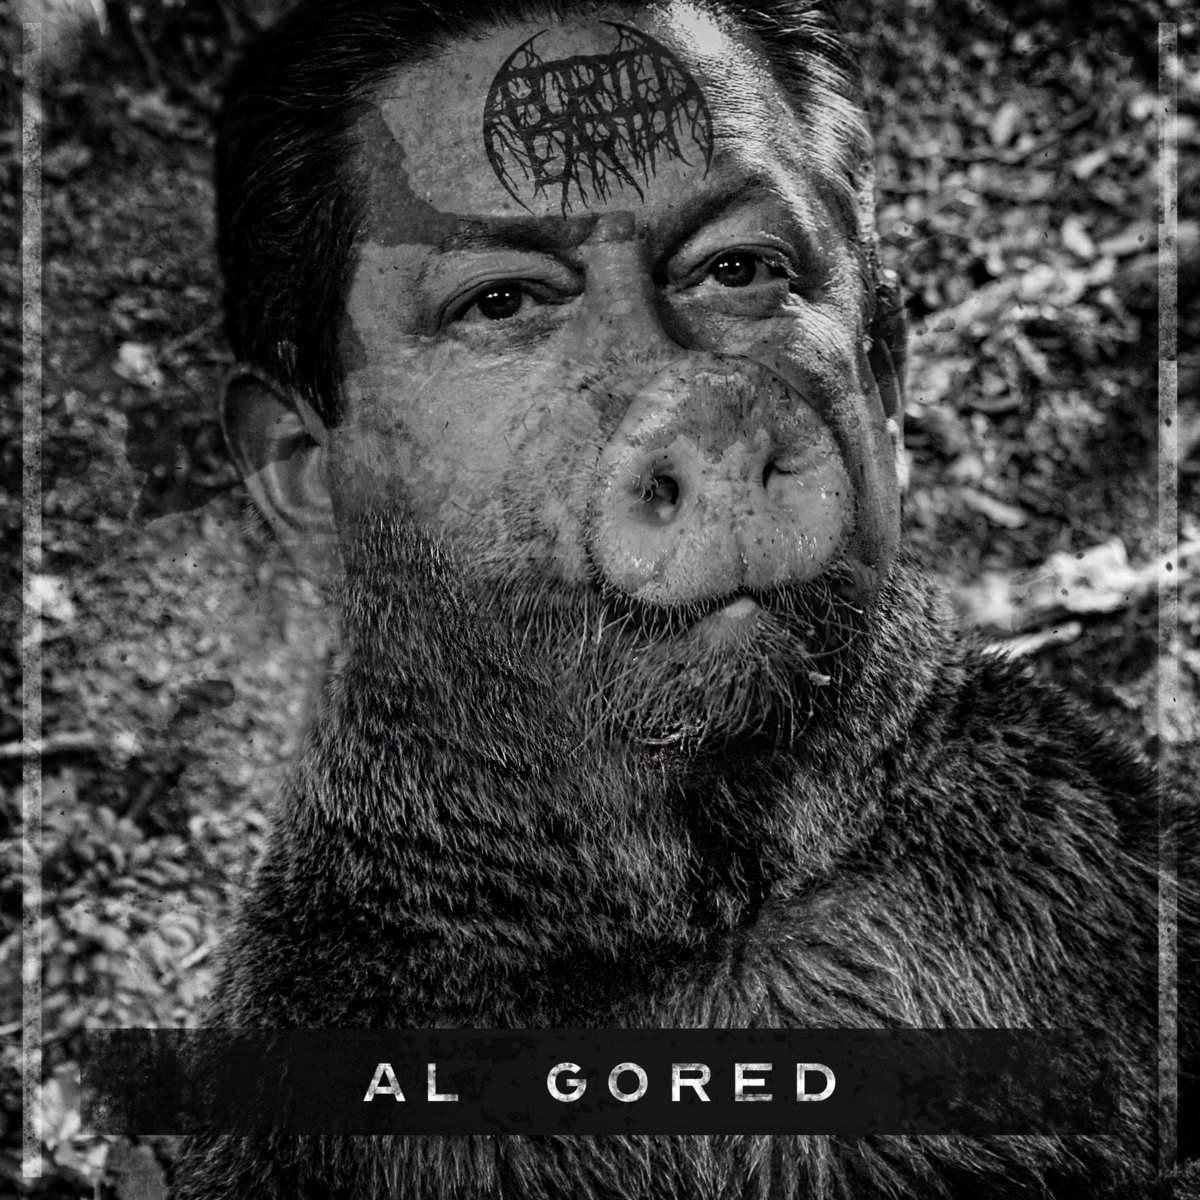 Aborted Earth - Al Gored